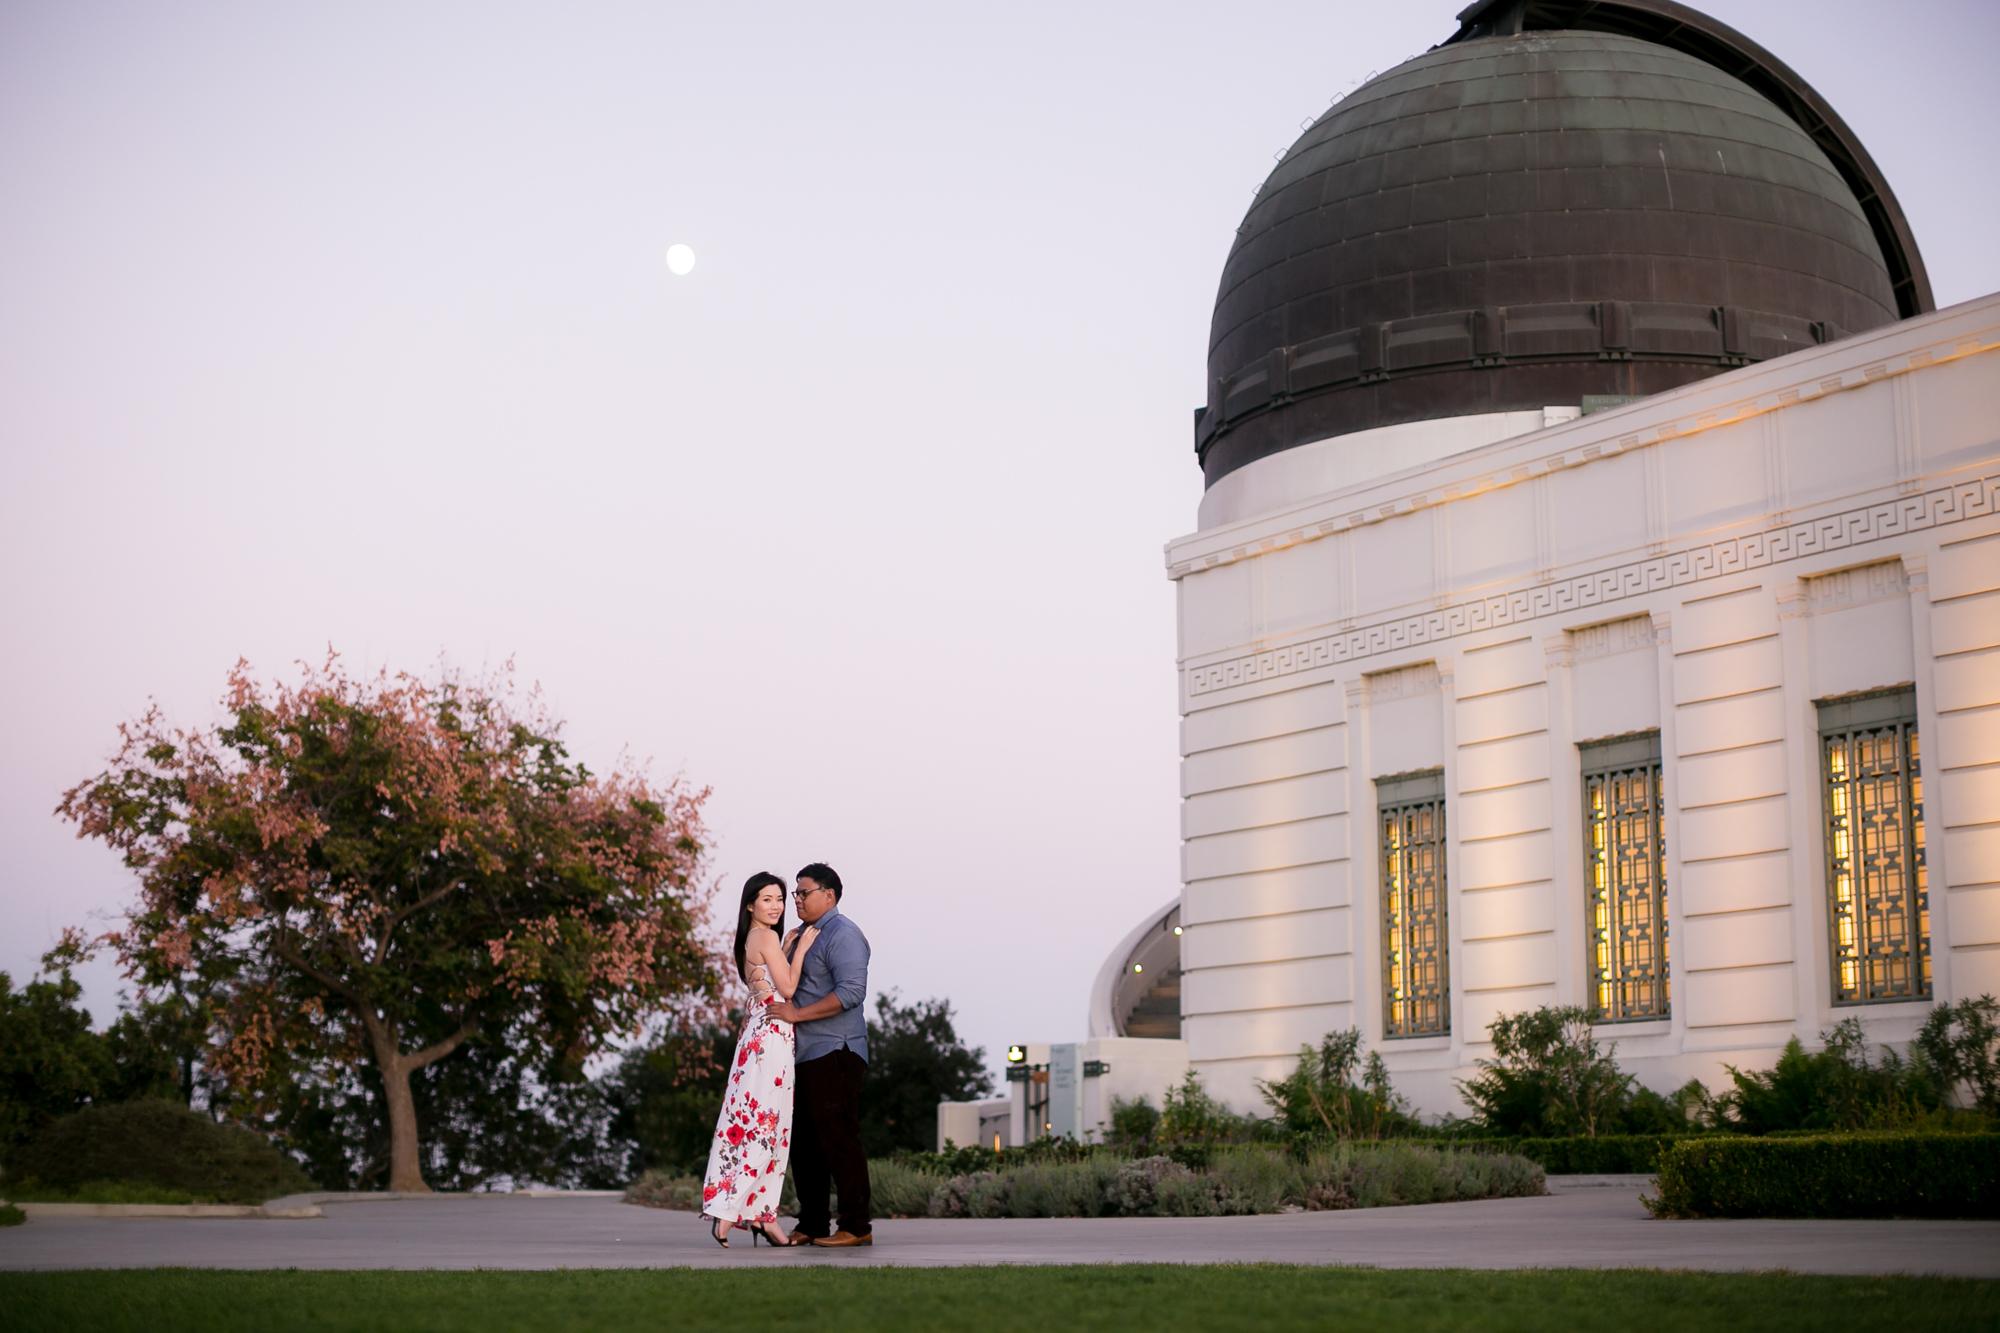 CM-Pasadena_City-Hall-Engagement-Photography-0009.jpg